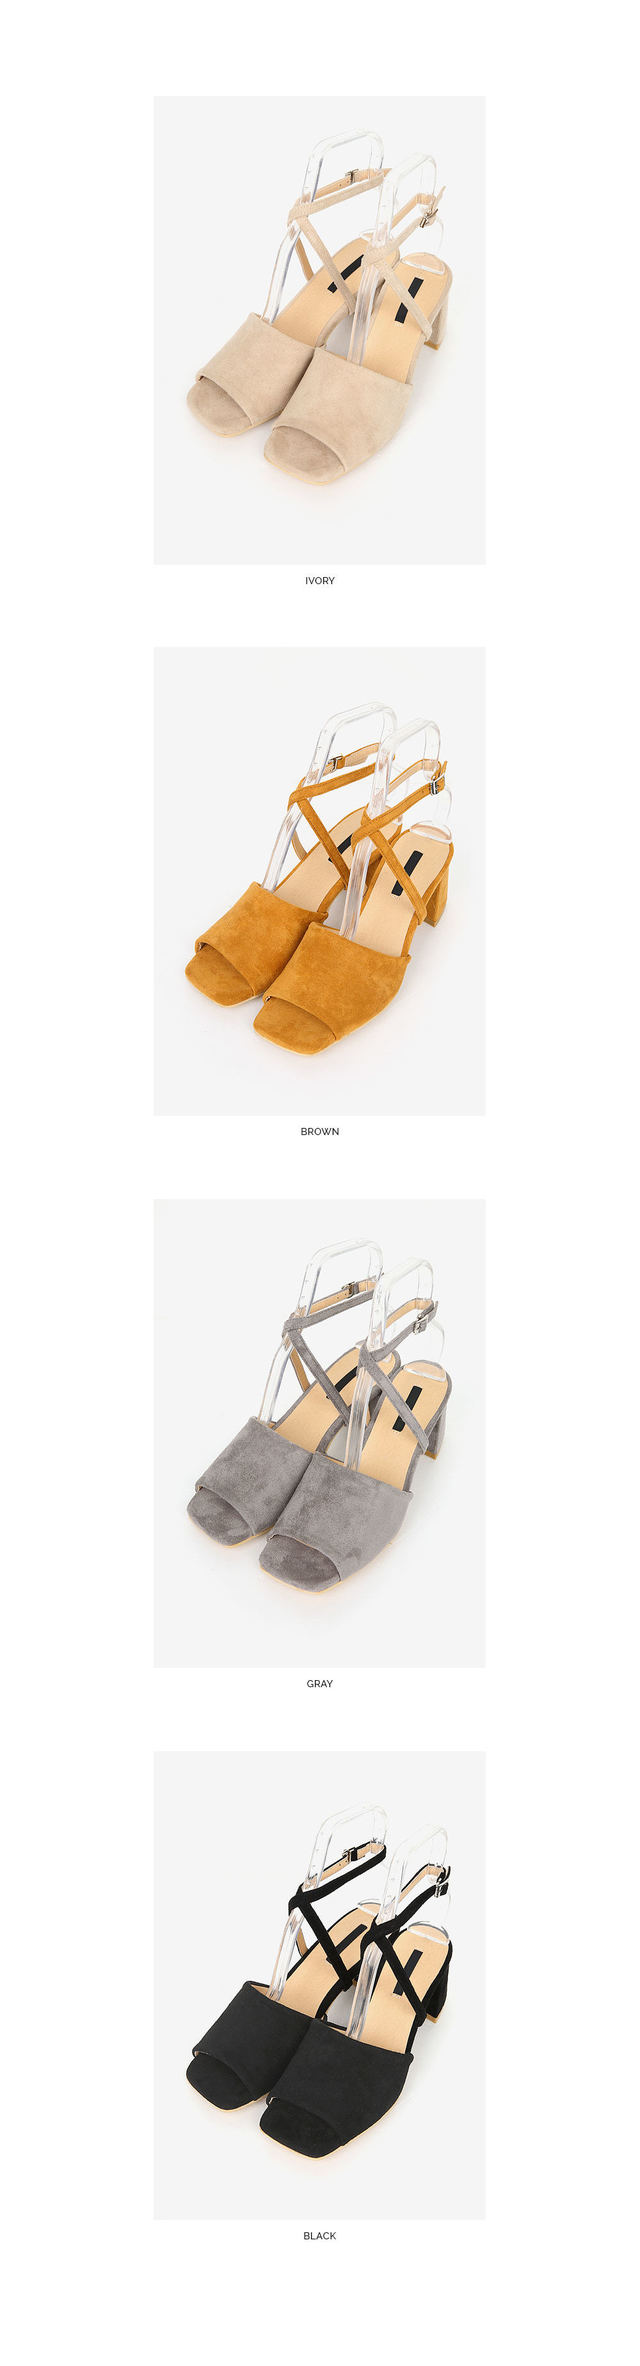 3-way daily sandal (225-250)